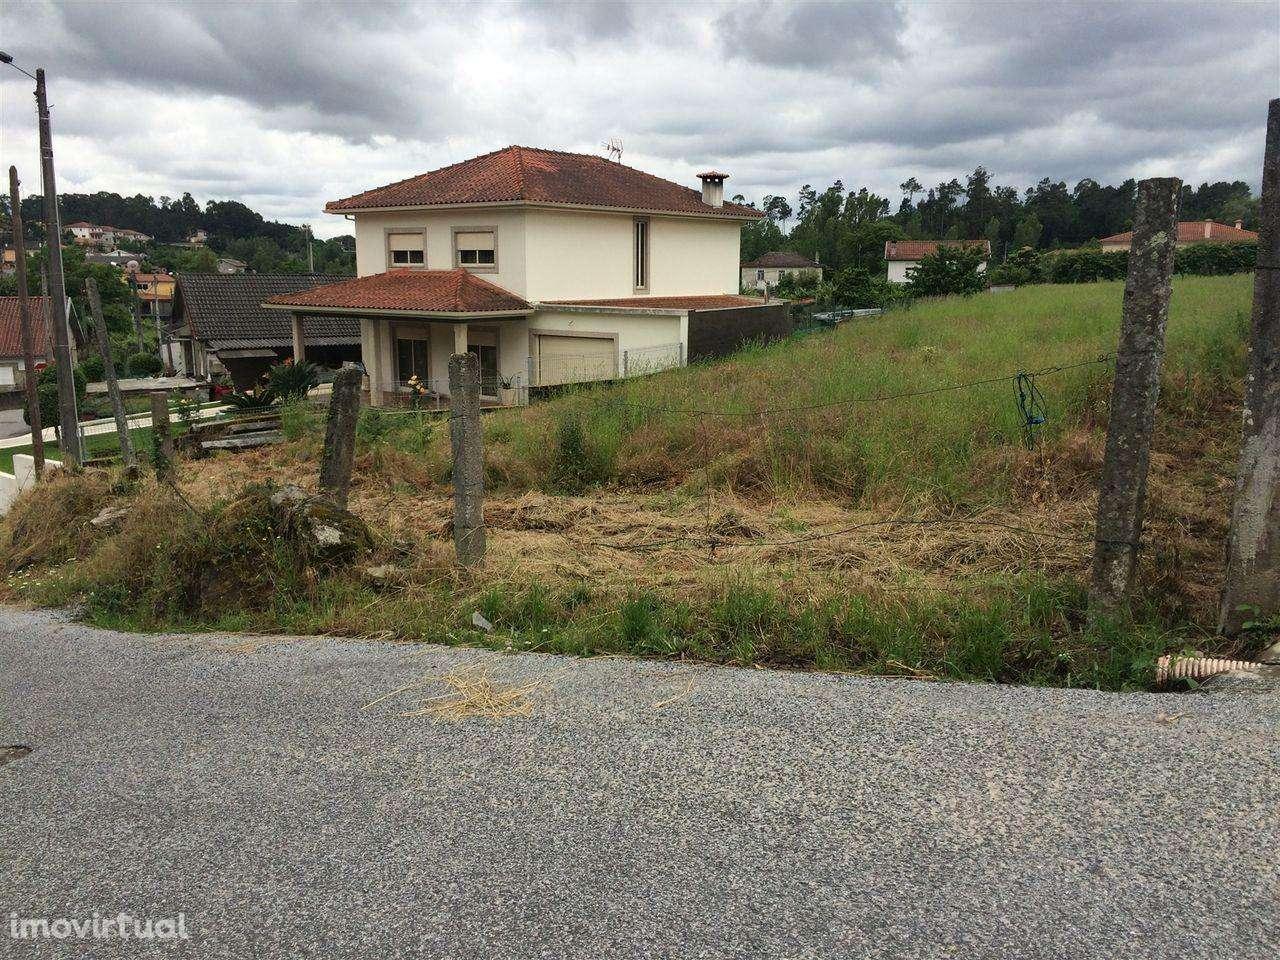 Terreno para comprar, Vila Verde e Barbudo, Braga - Foto 4